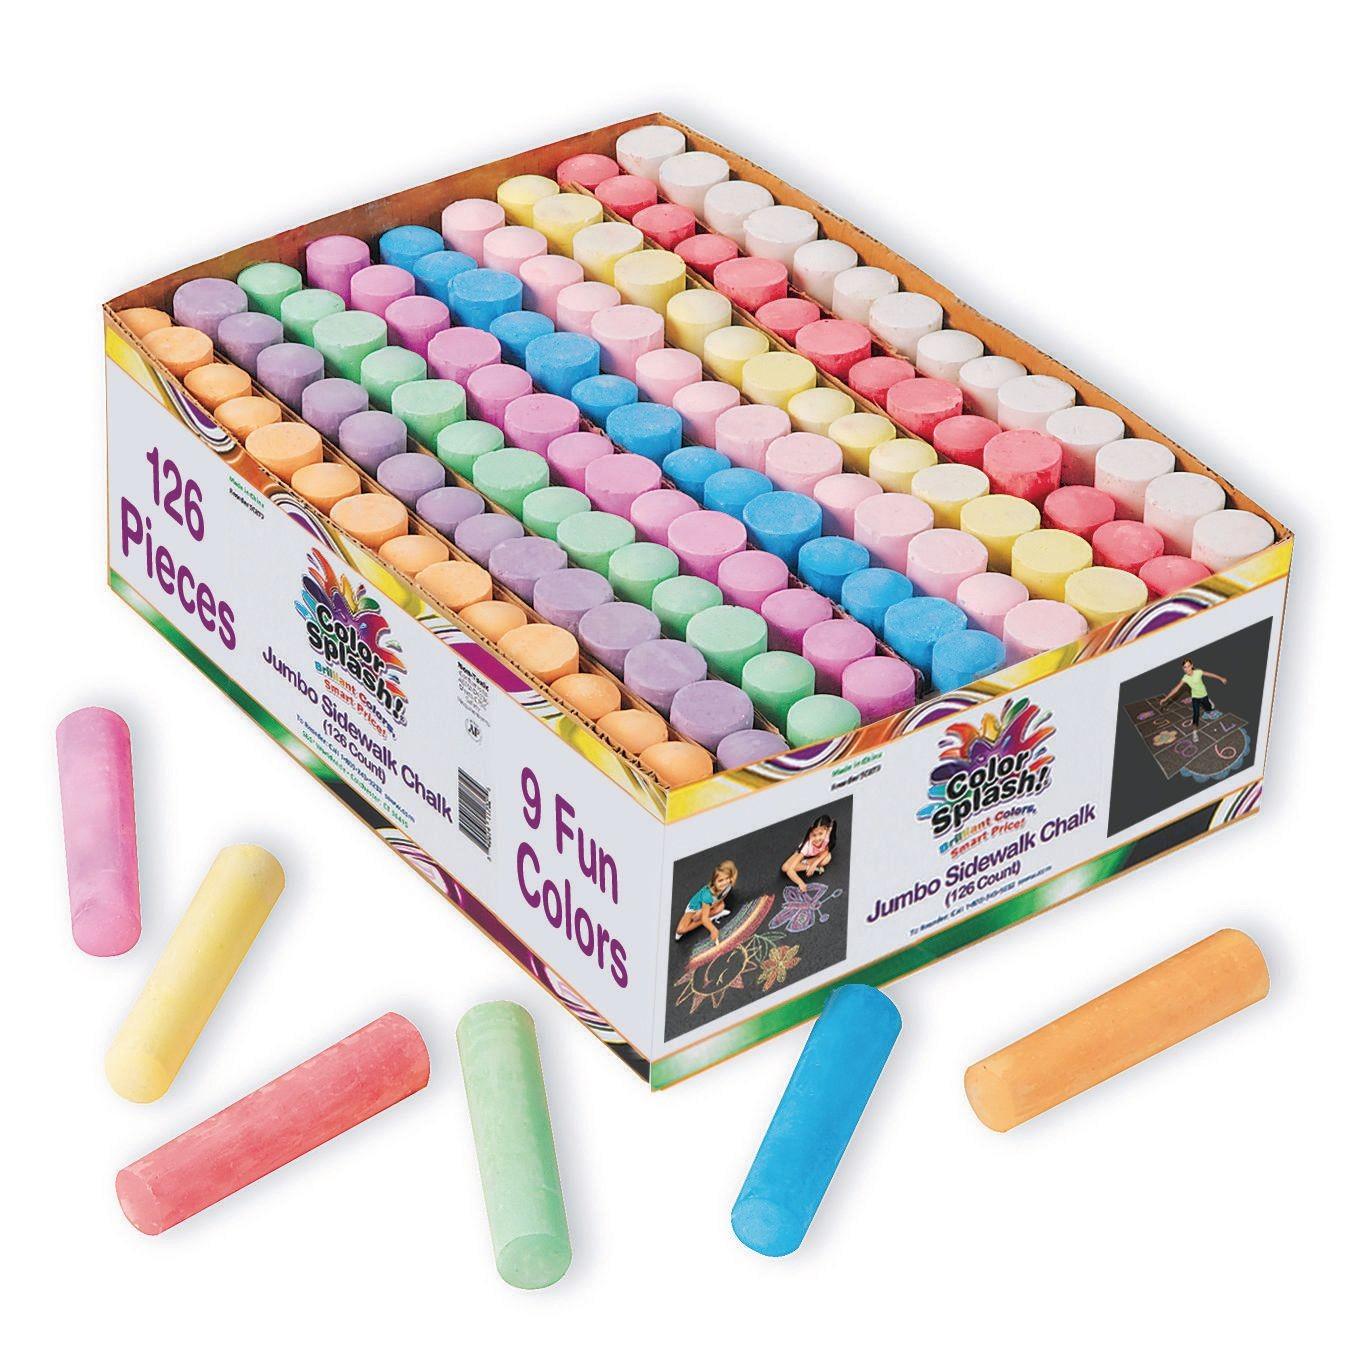 12x Mixed Colour Chalk Jumbo Sidewalk Chalk Sticks Playground Giant Chalks